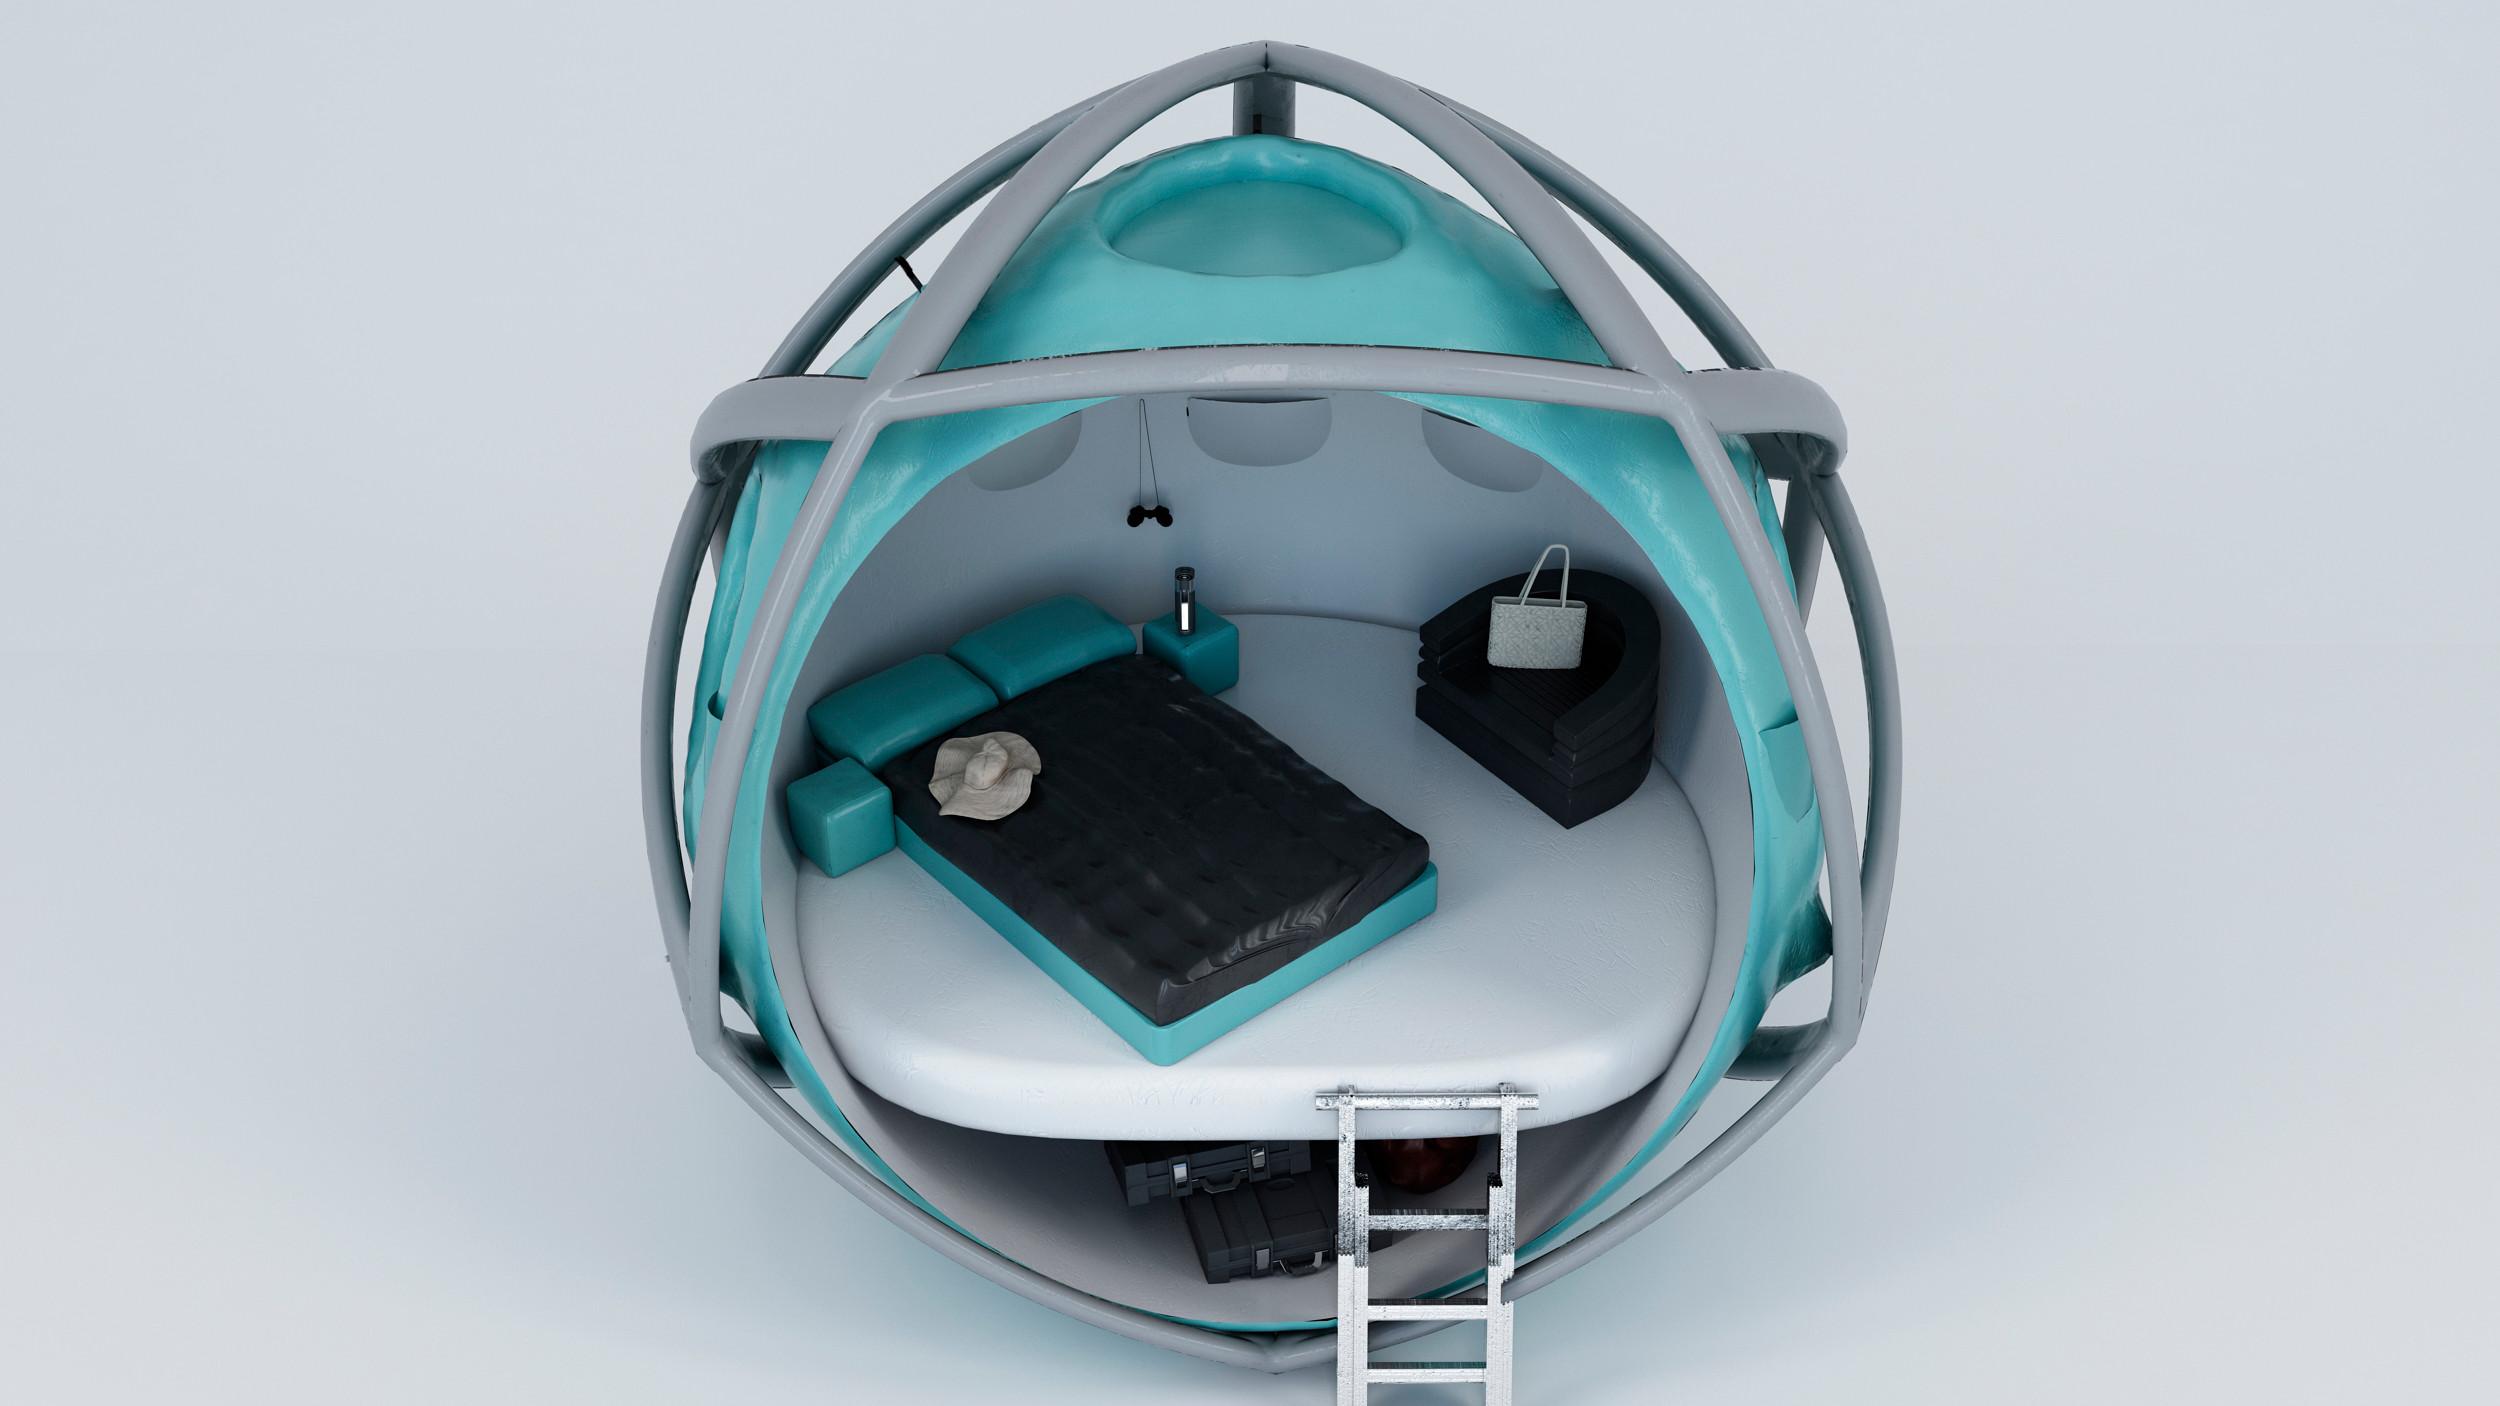 Inside the Capsule